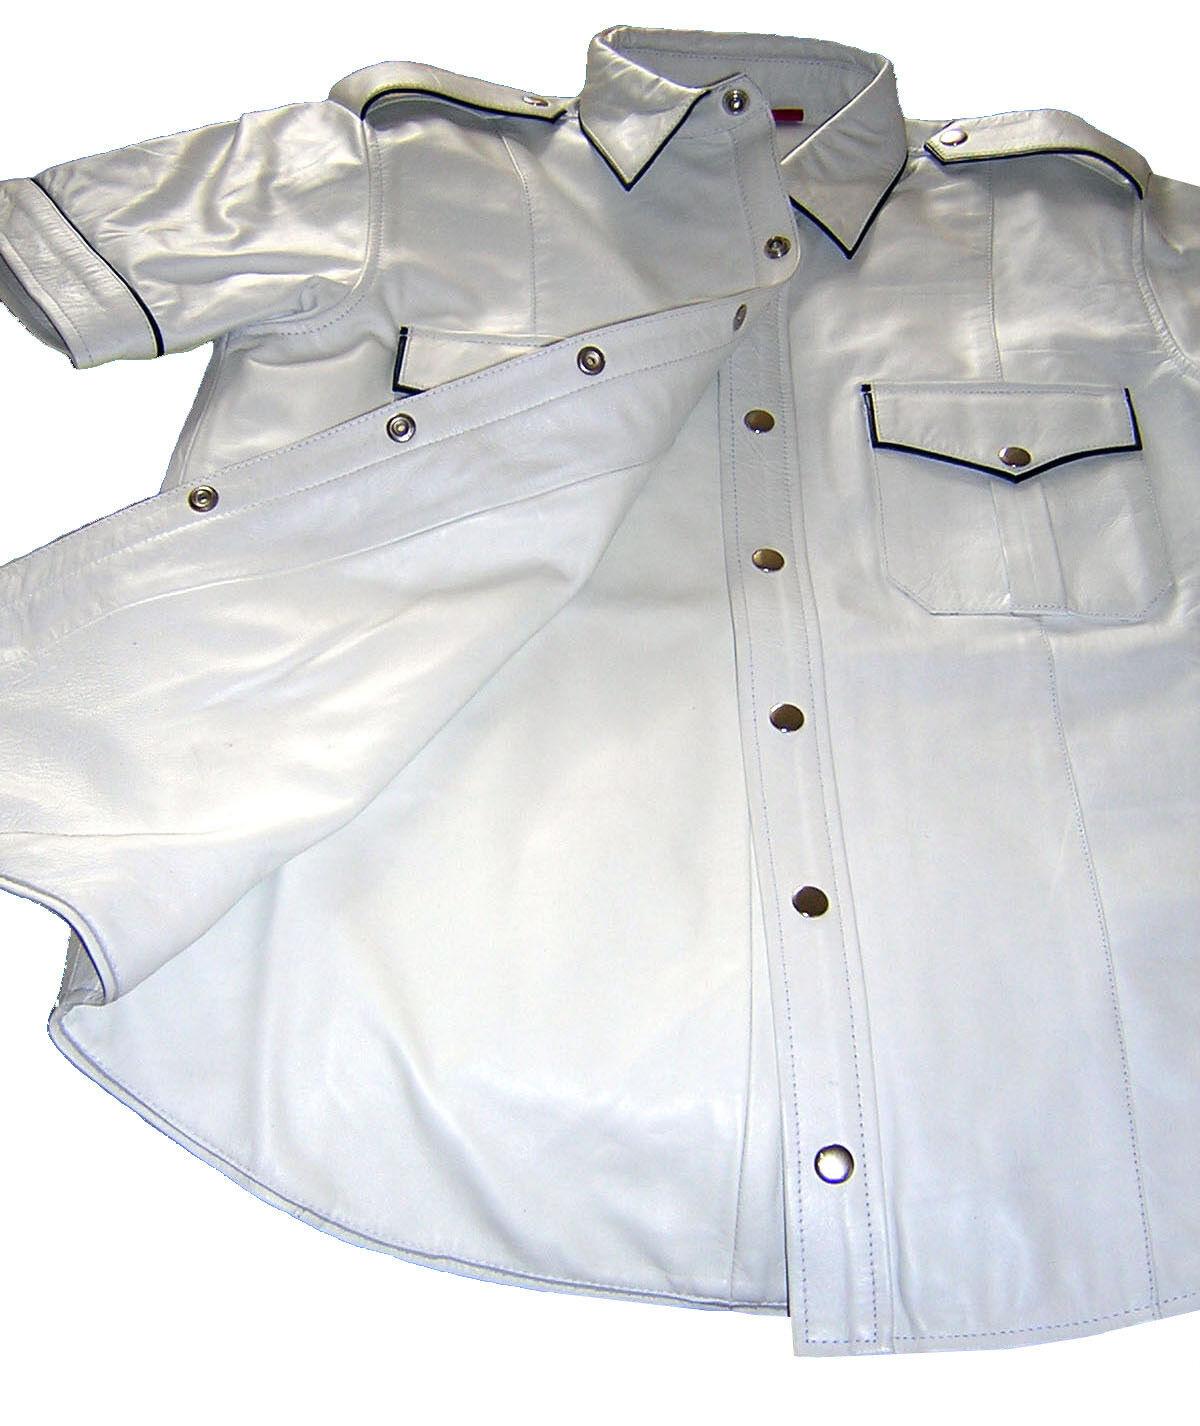 Camicia IN PELLE NUOVO BIANCO NERO CAMICIA PIEGHE BIANCO in PELLE Leather Shirt bianca New cuir